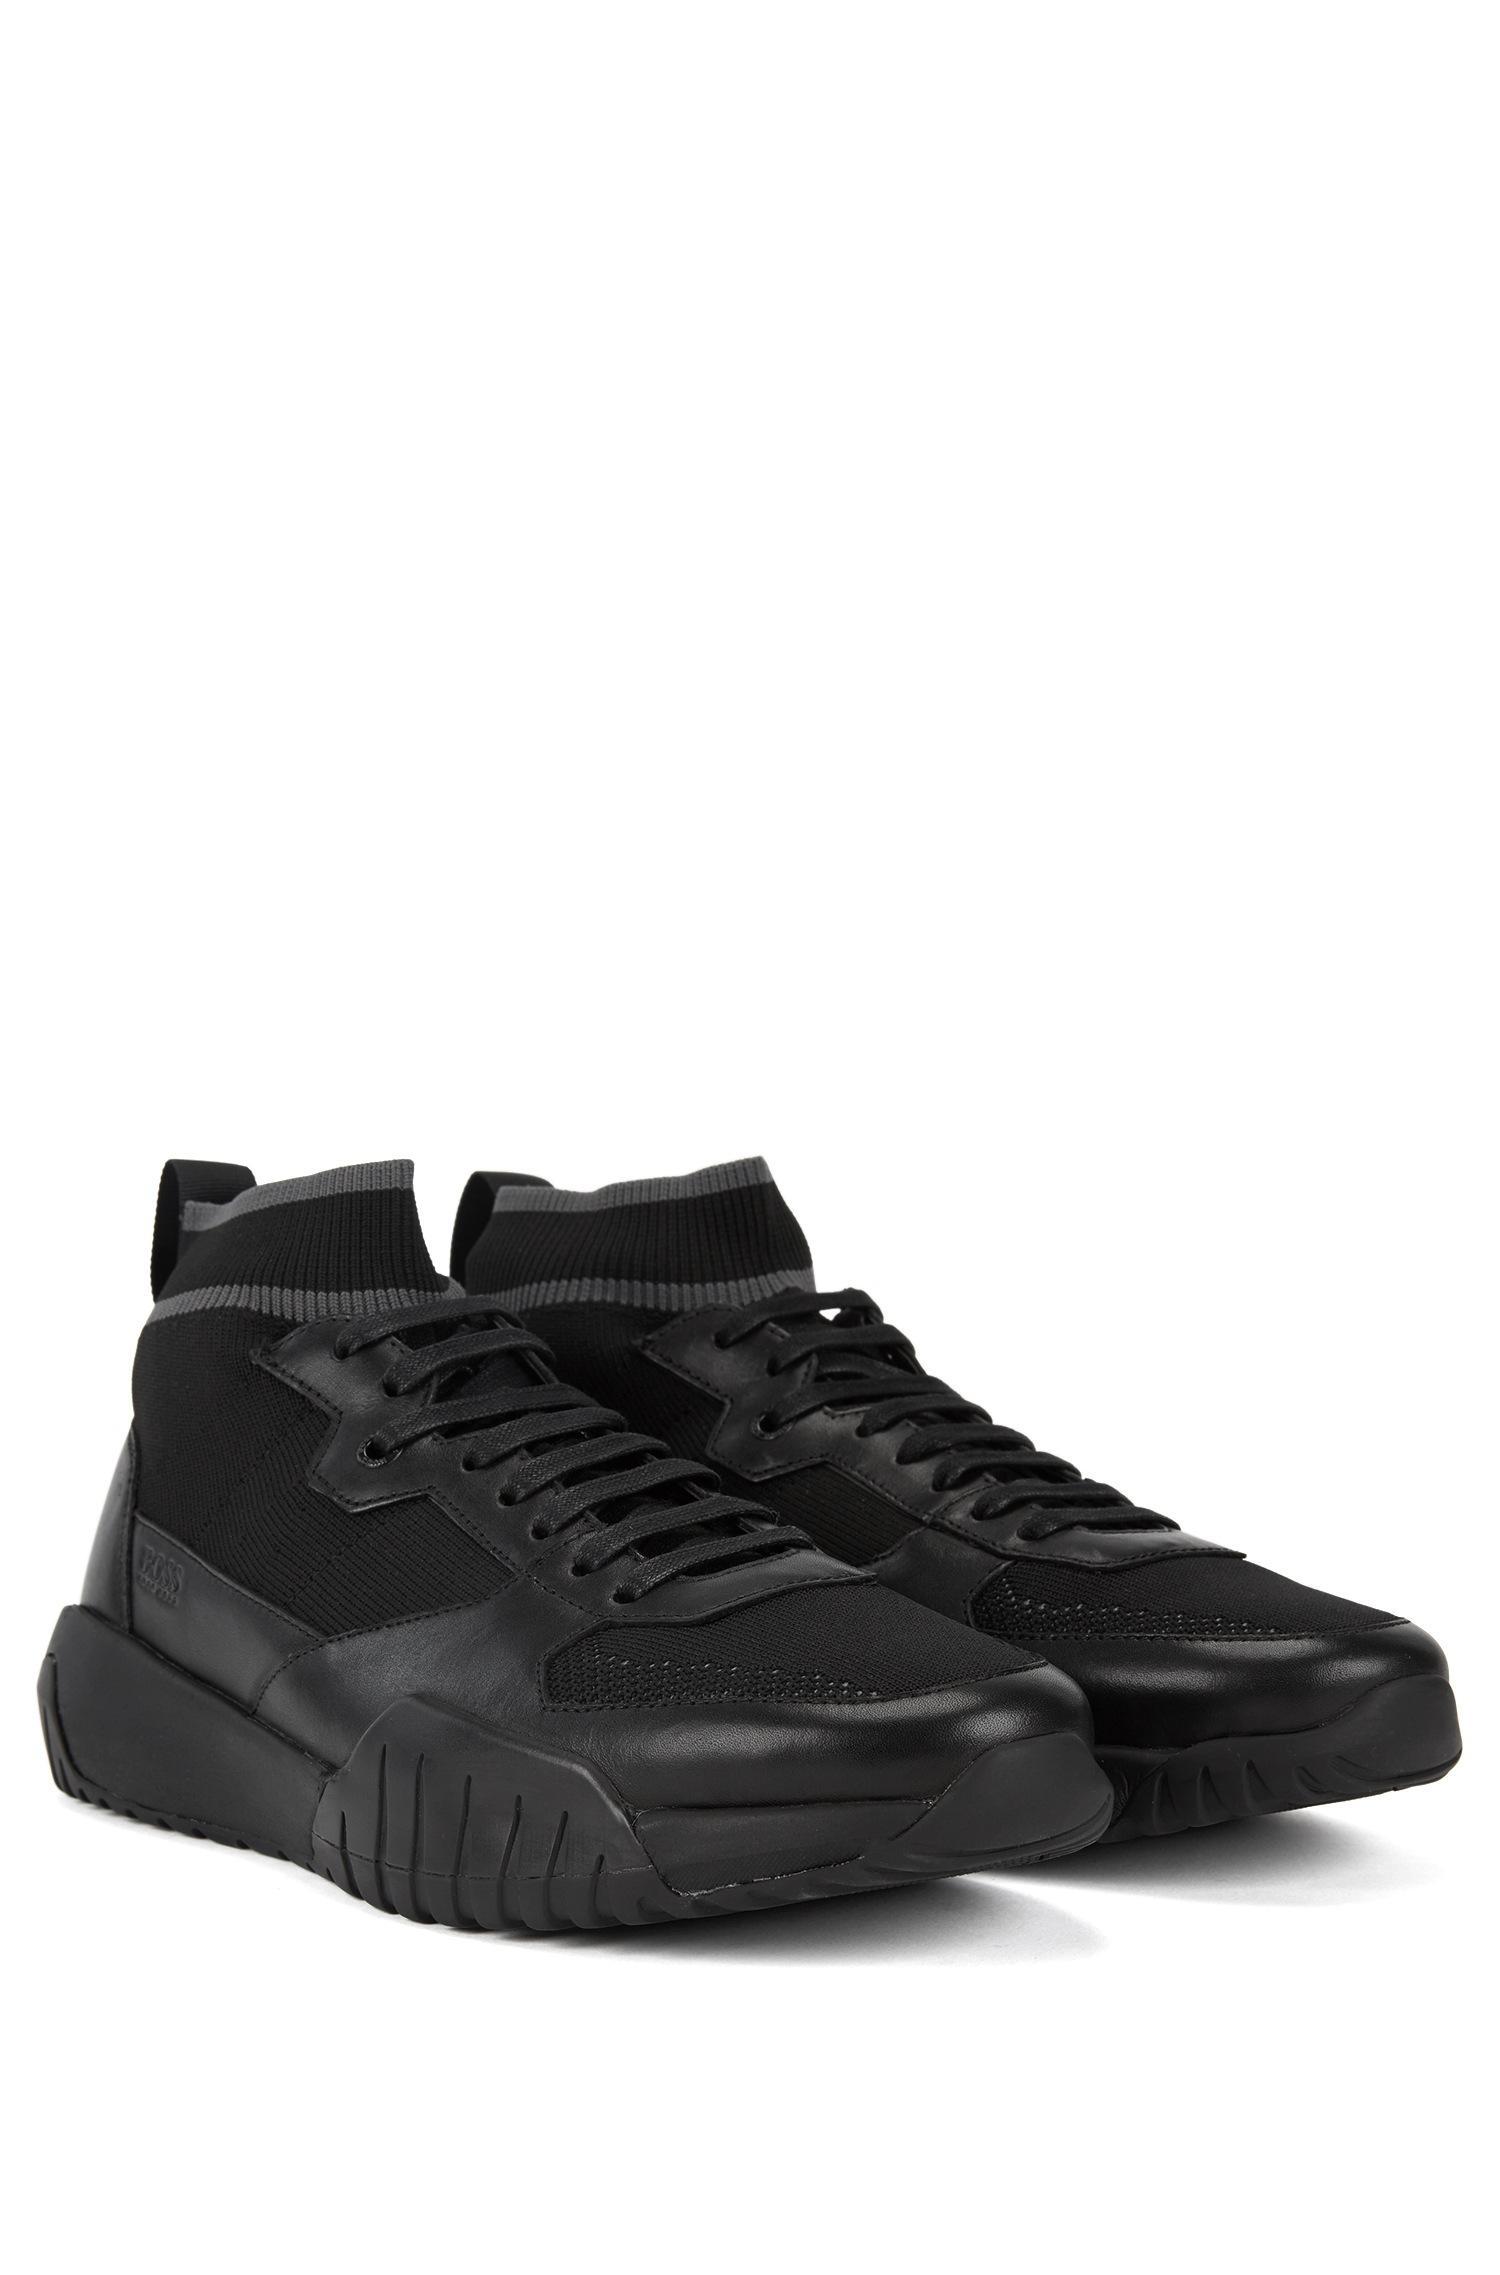 898de15e2f7 BOSS - Black High-top Sock Sneakers With Calf-leather Trims for Men -. View  fullscreen